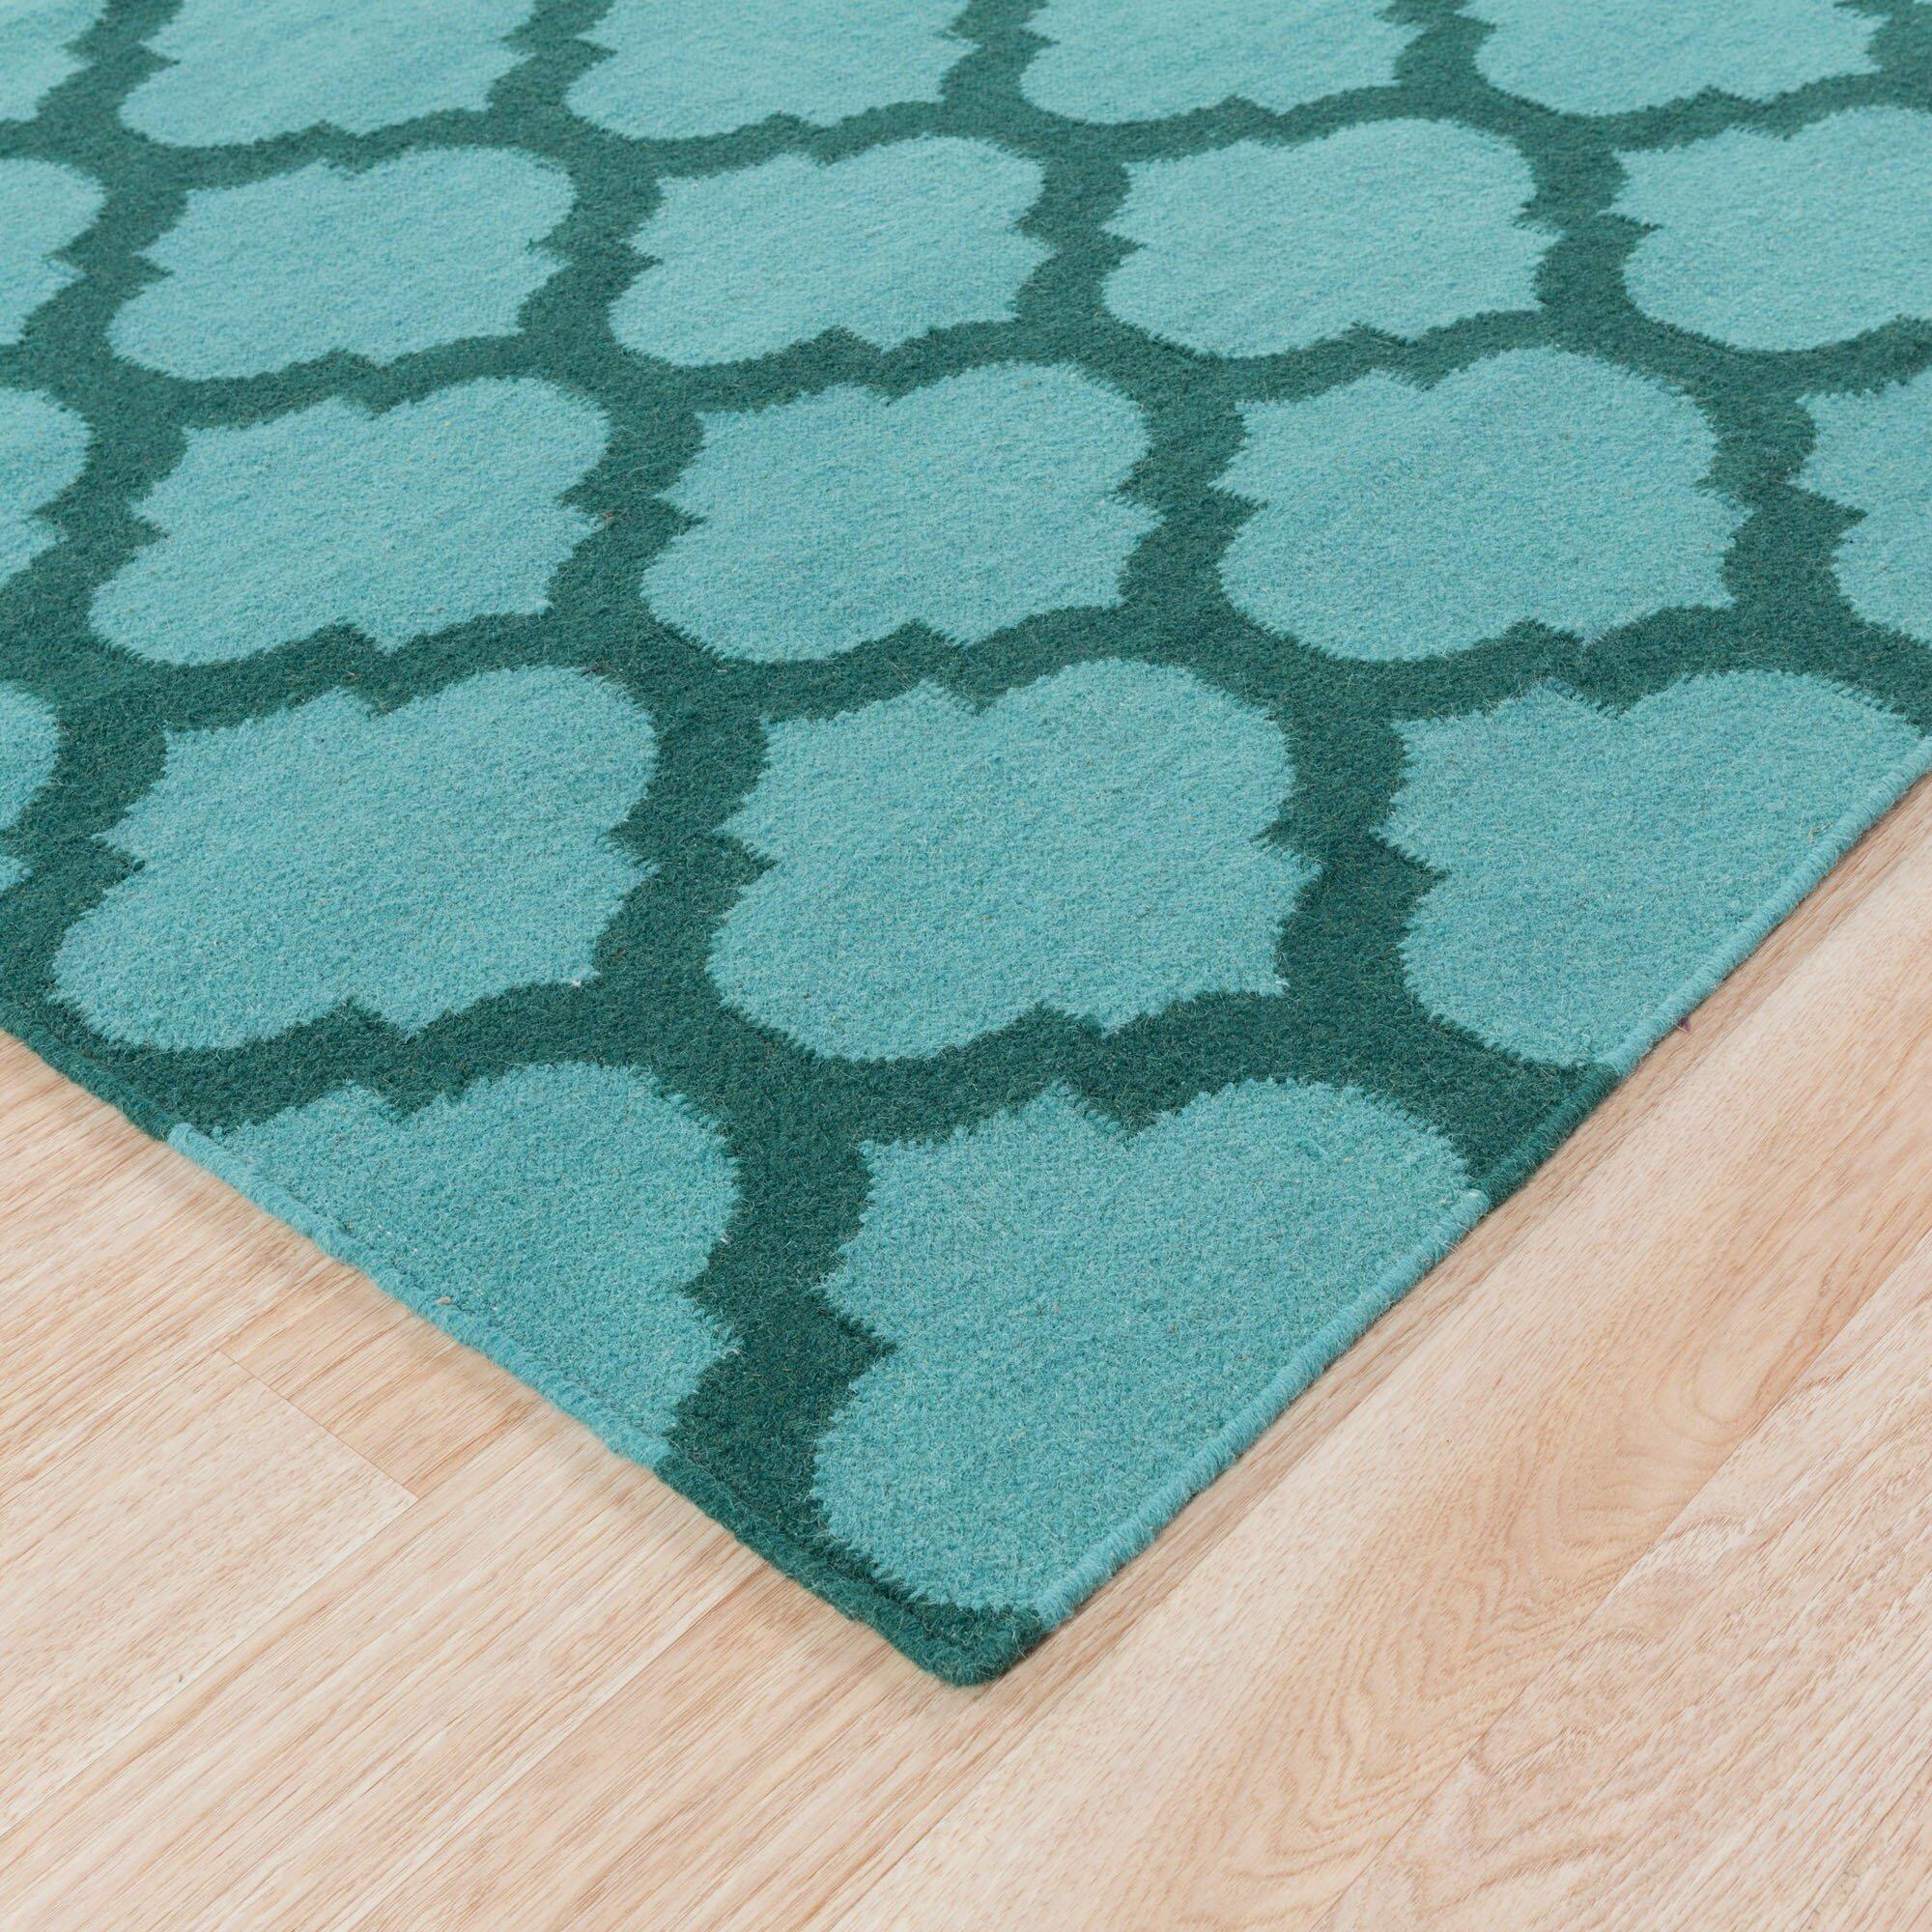 langley street ash hand woven teal dark green area rug reviews wayfair. Black Bedroom Furniture Sets. Home Design Ideas